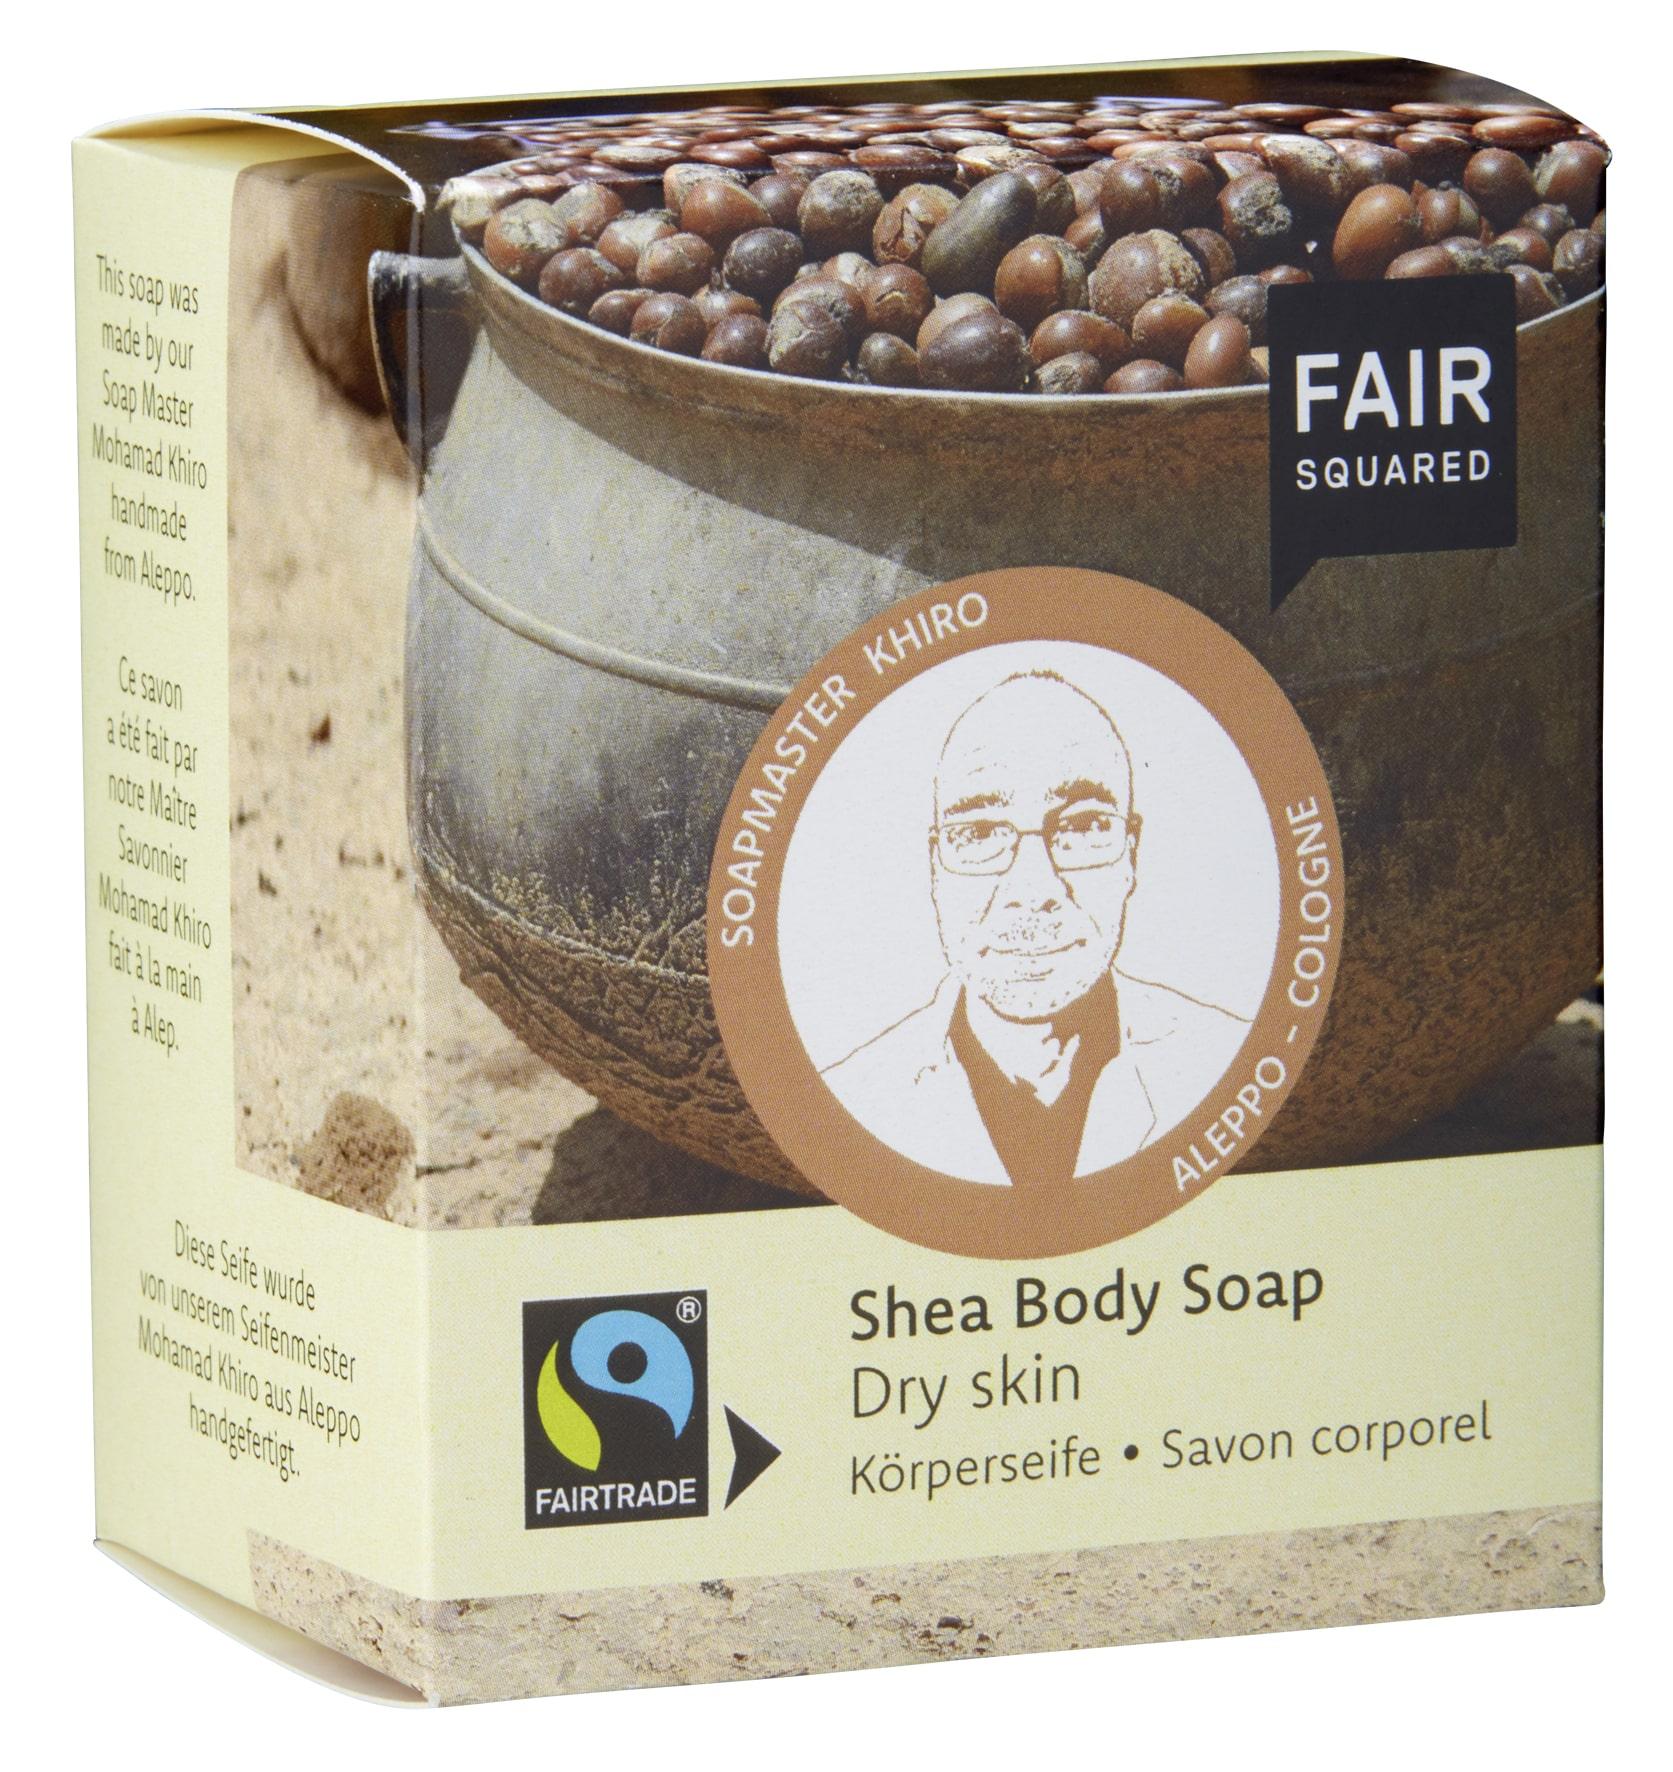 Shea Body Soap Dry Skin